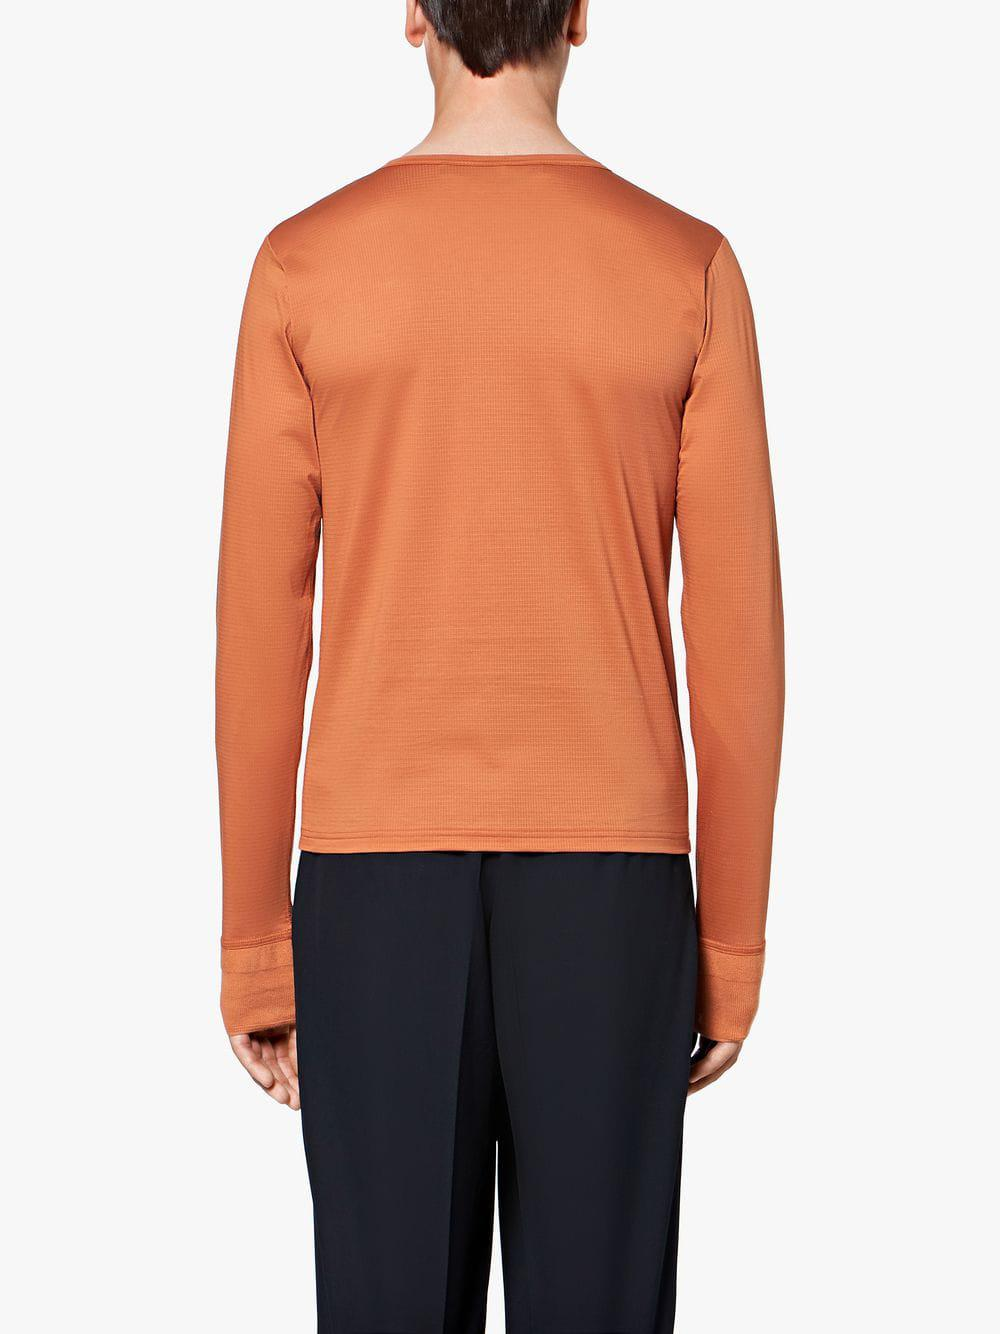 83b91ea04d5 Lyst - Mackintosh 0003 Amber Cotton 0003 Henley Shirt in Orange for Men